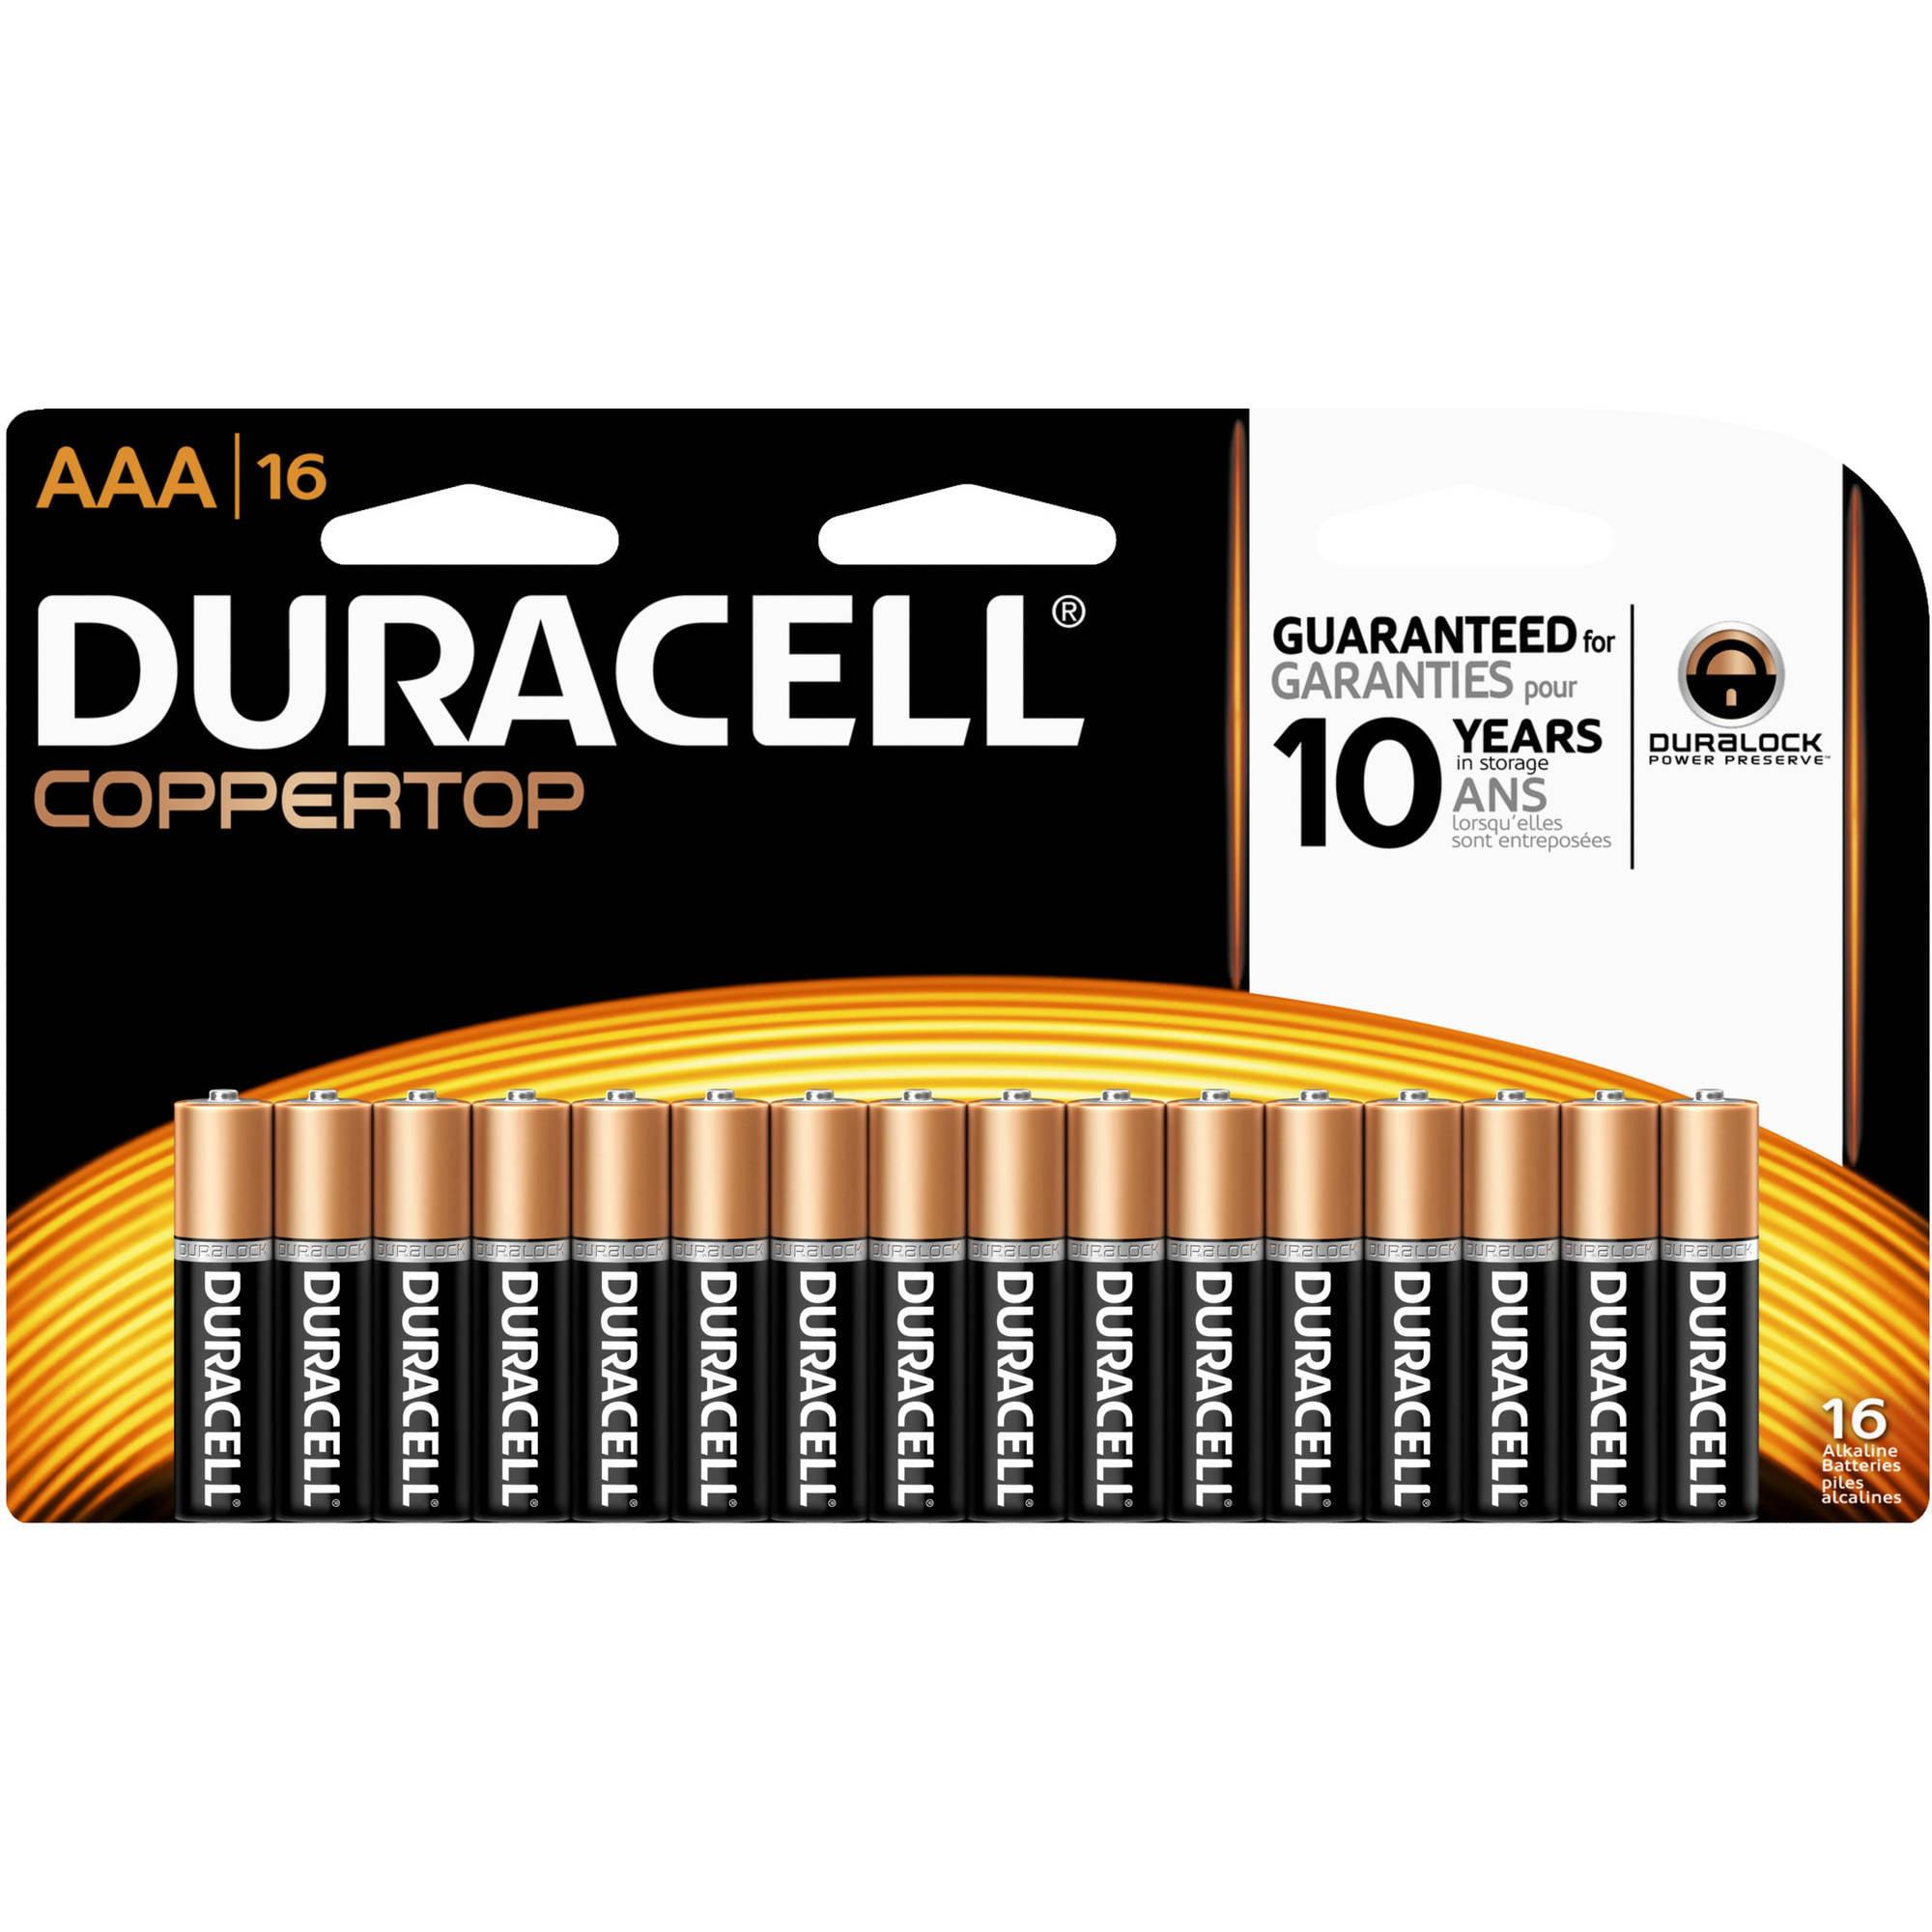 Duracell CopperTop AAA Alkaline Batteries, 16ct